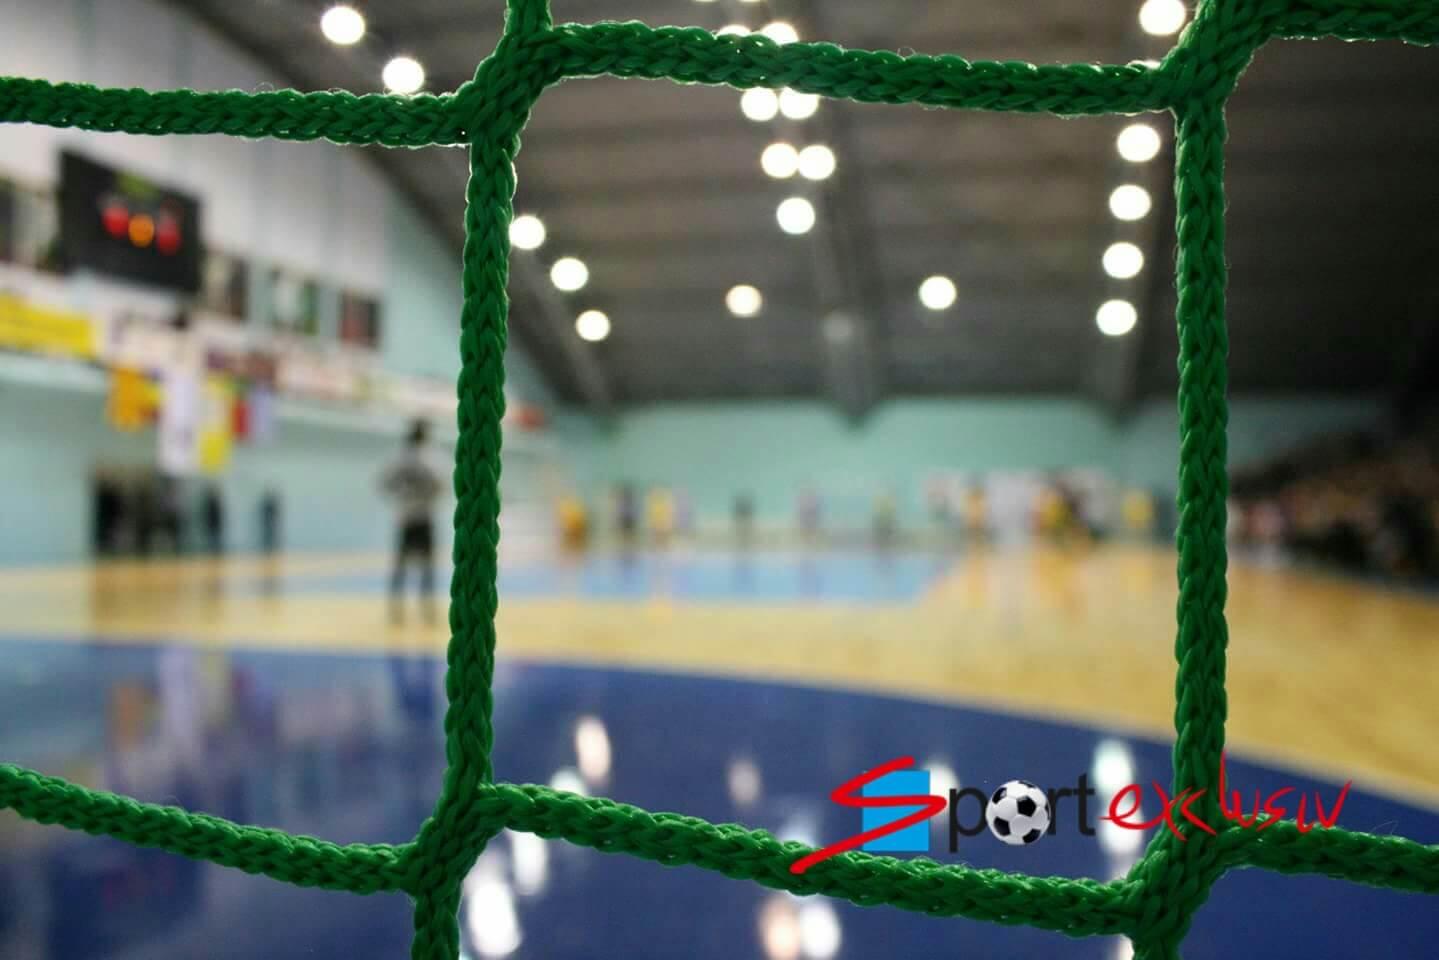 Rezultatele etapei a 2-a la handbal feminin sezonul 2017-2018 Rezultatele etapei a 2-a la handbal feminin sezonul 2017-2018 rezultate live handbal feminin